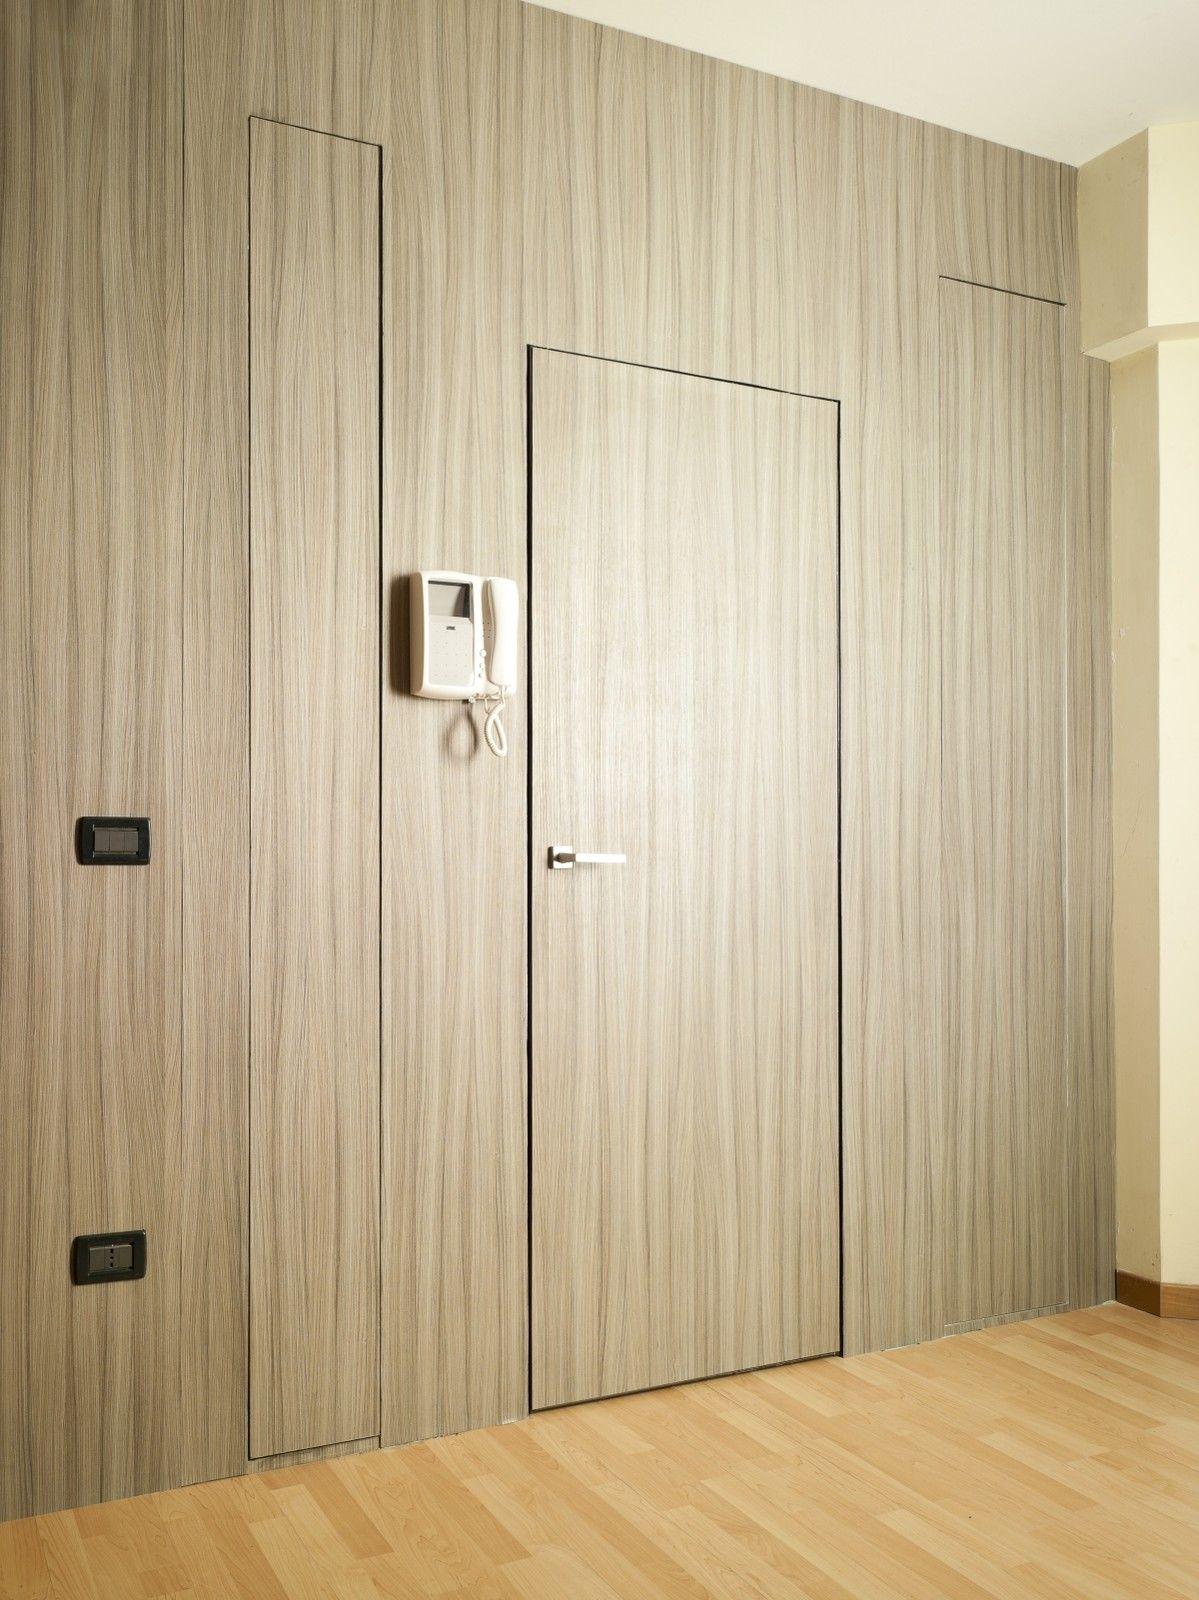 Porte blindate raso muro generaltek - Porte raso muro ...